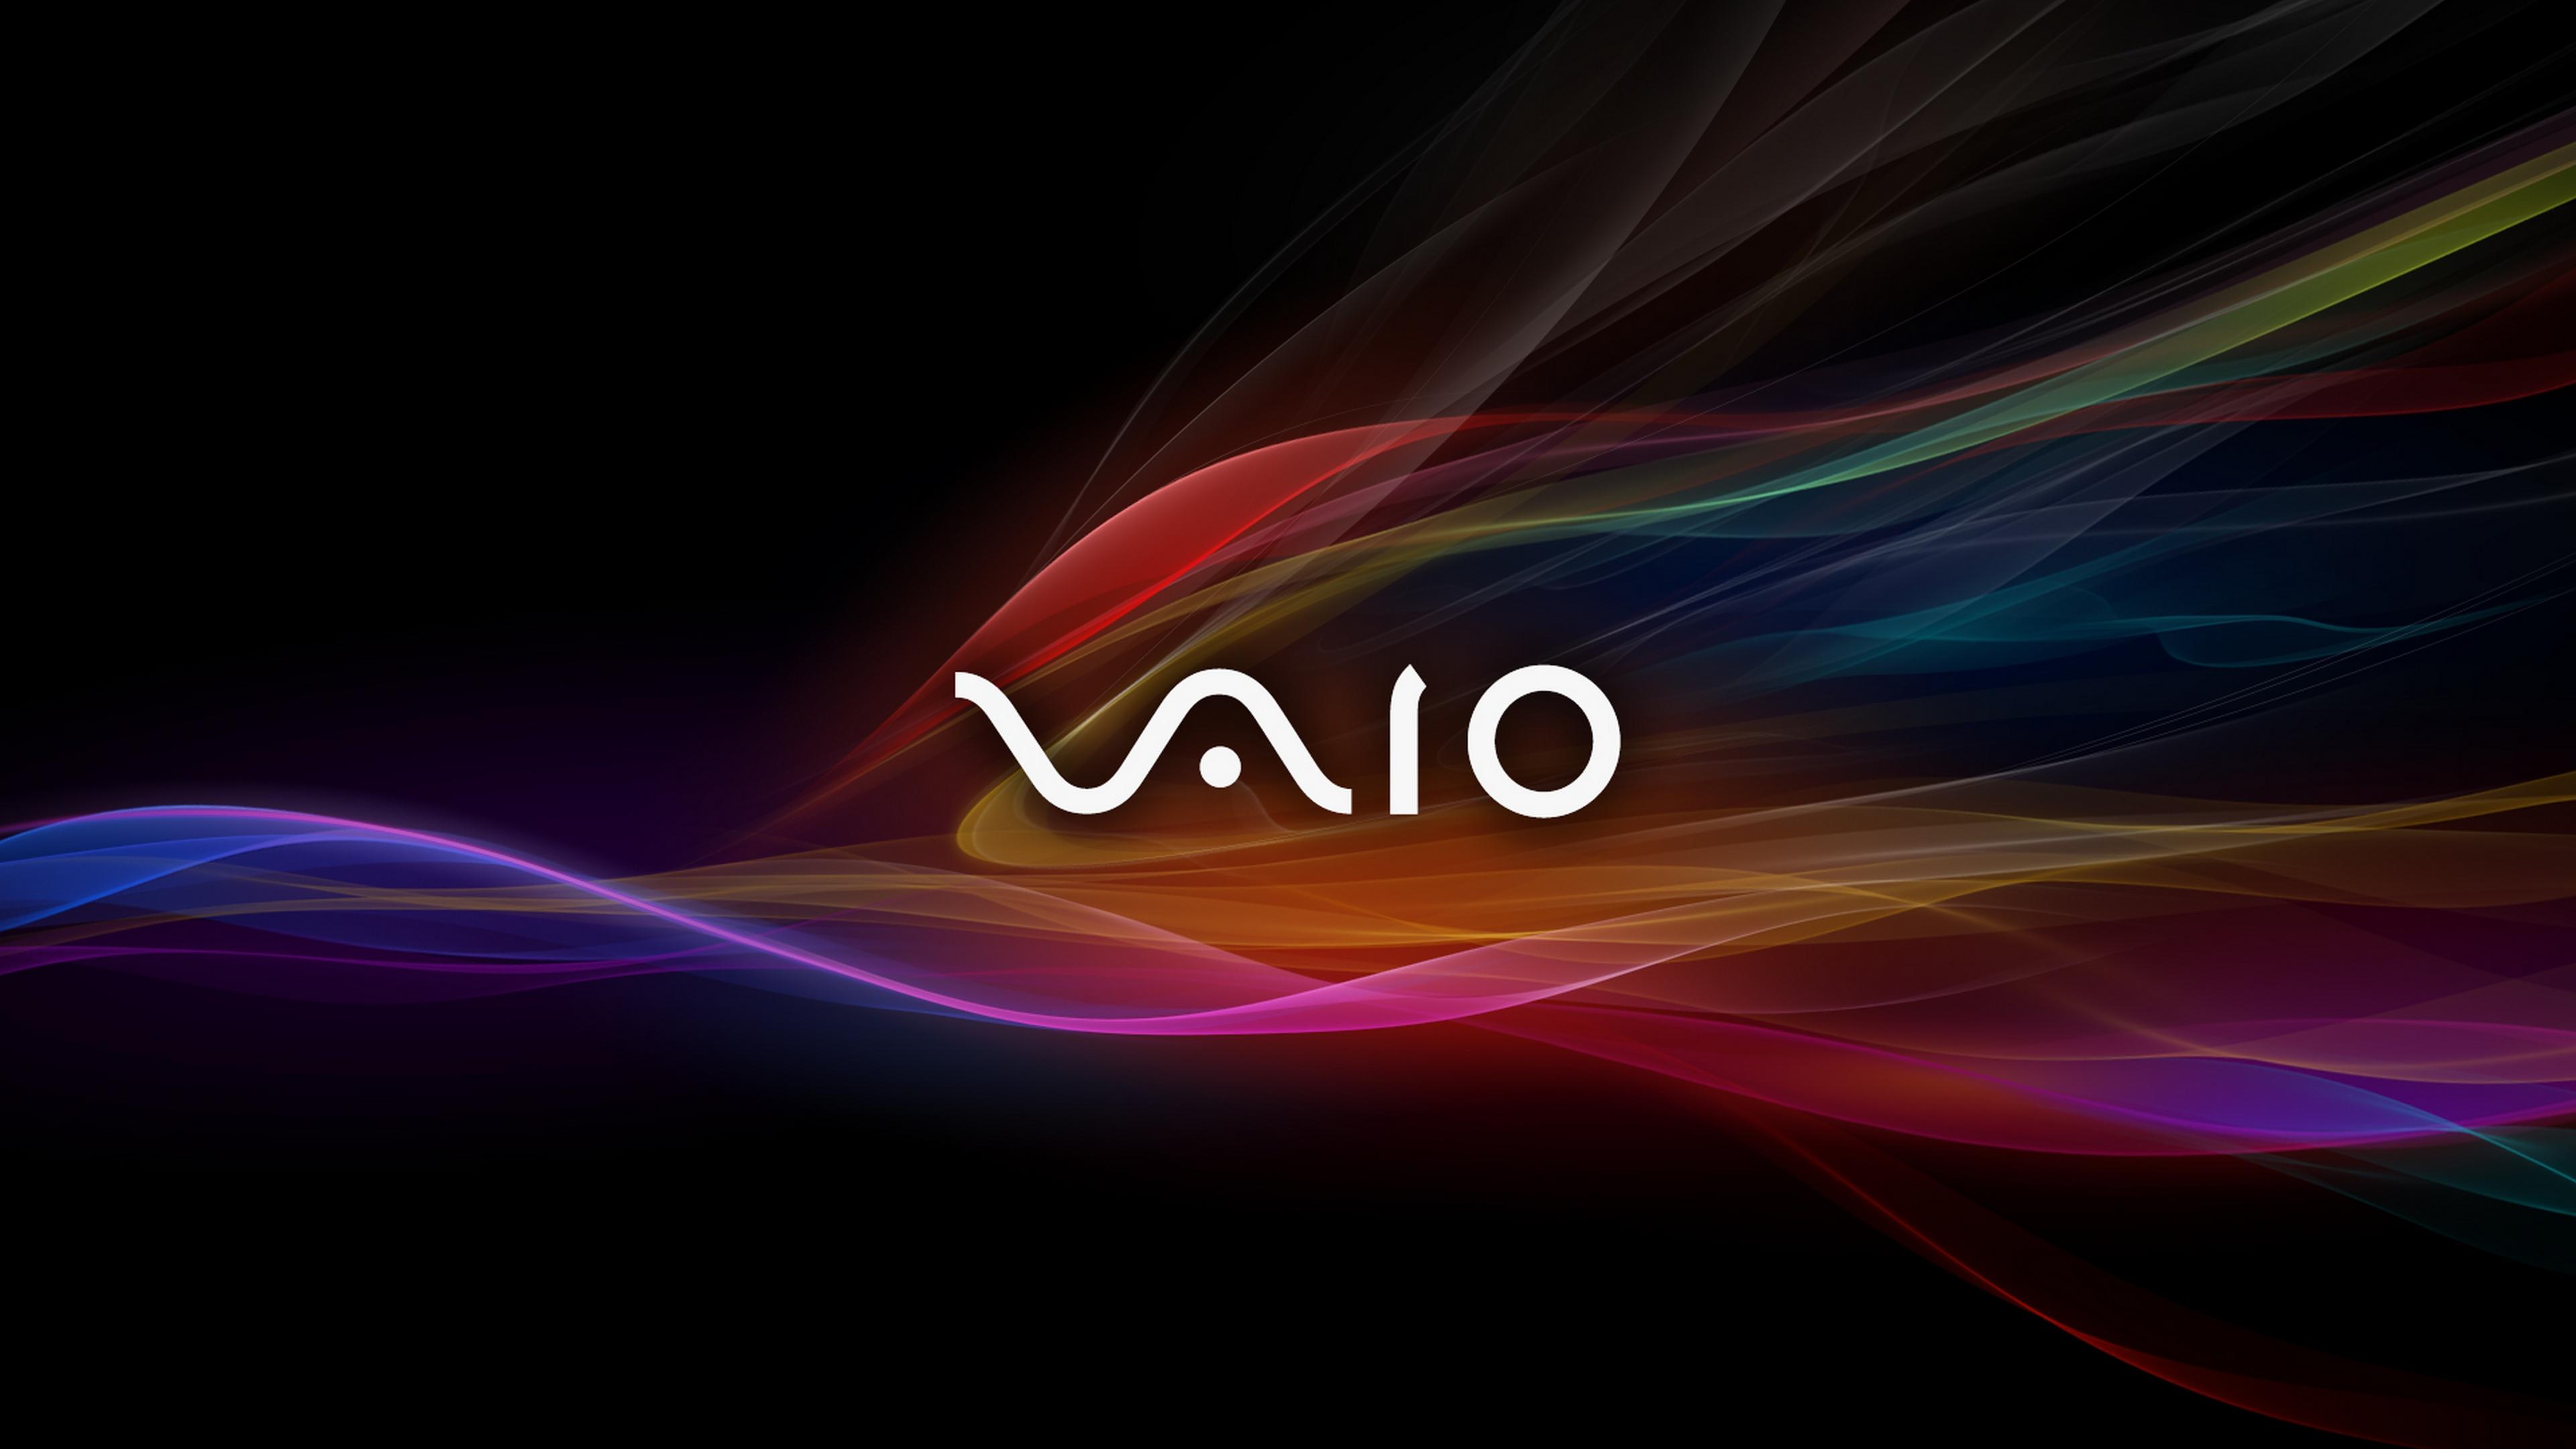 sony vaio fit wallpaper 4k by wishajen customization wallpaper hdtv 3840x2160